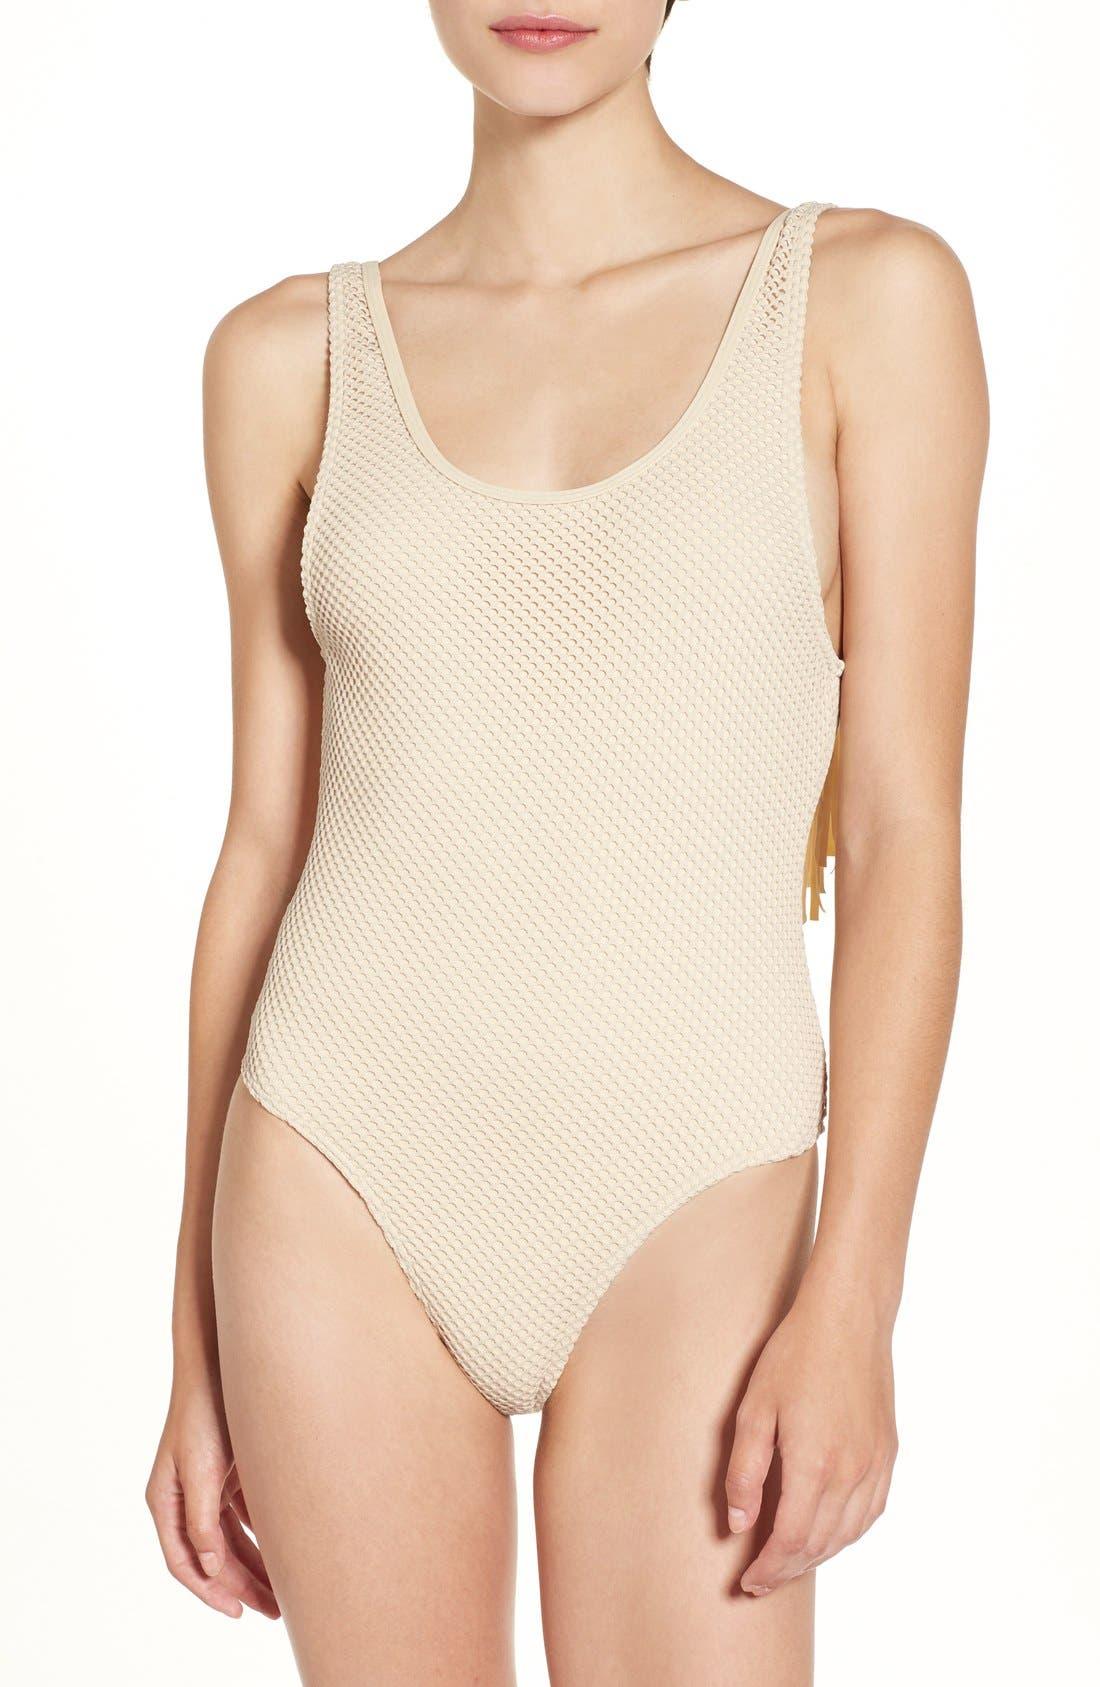 Alternate Image 2  - Rip Curl 'Joyride' Fringe One-Piece Swimsuit